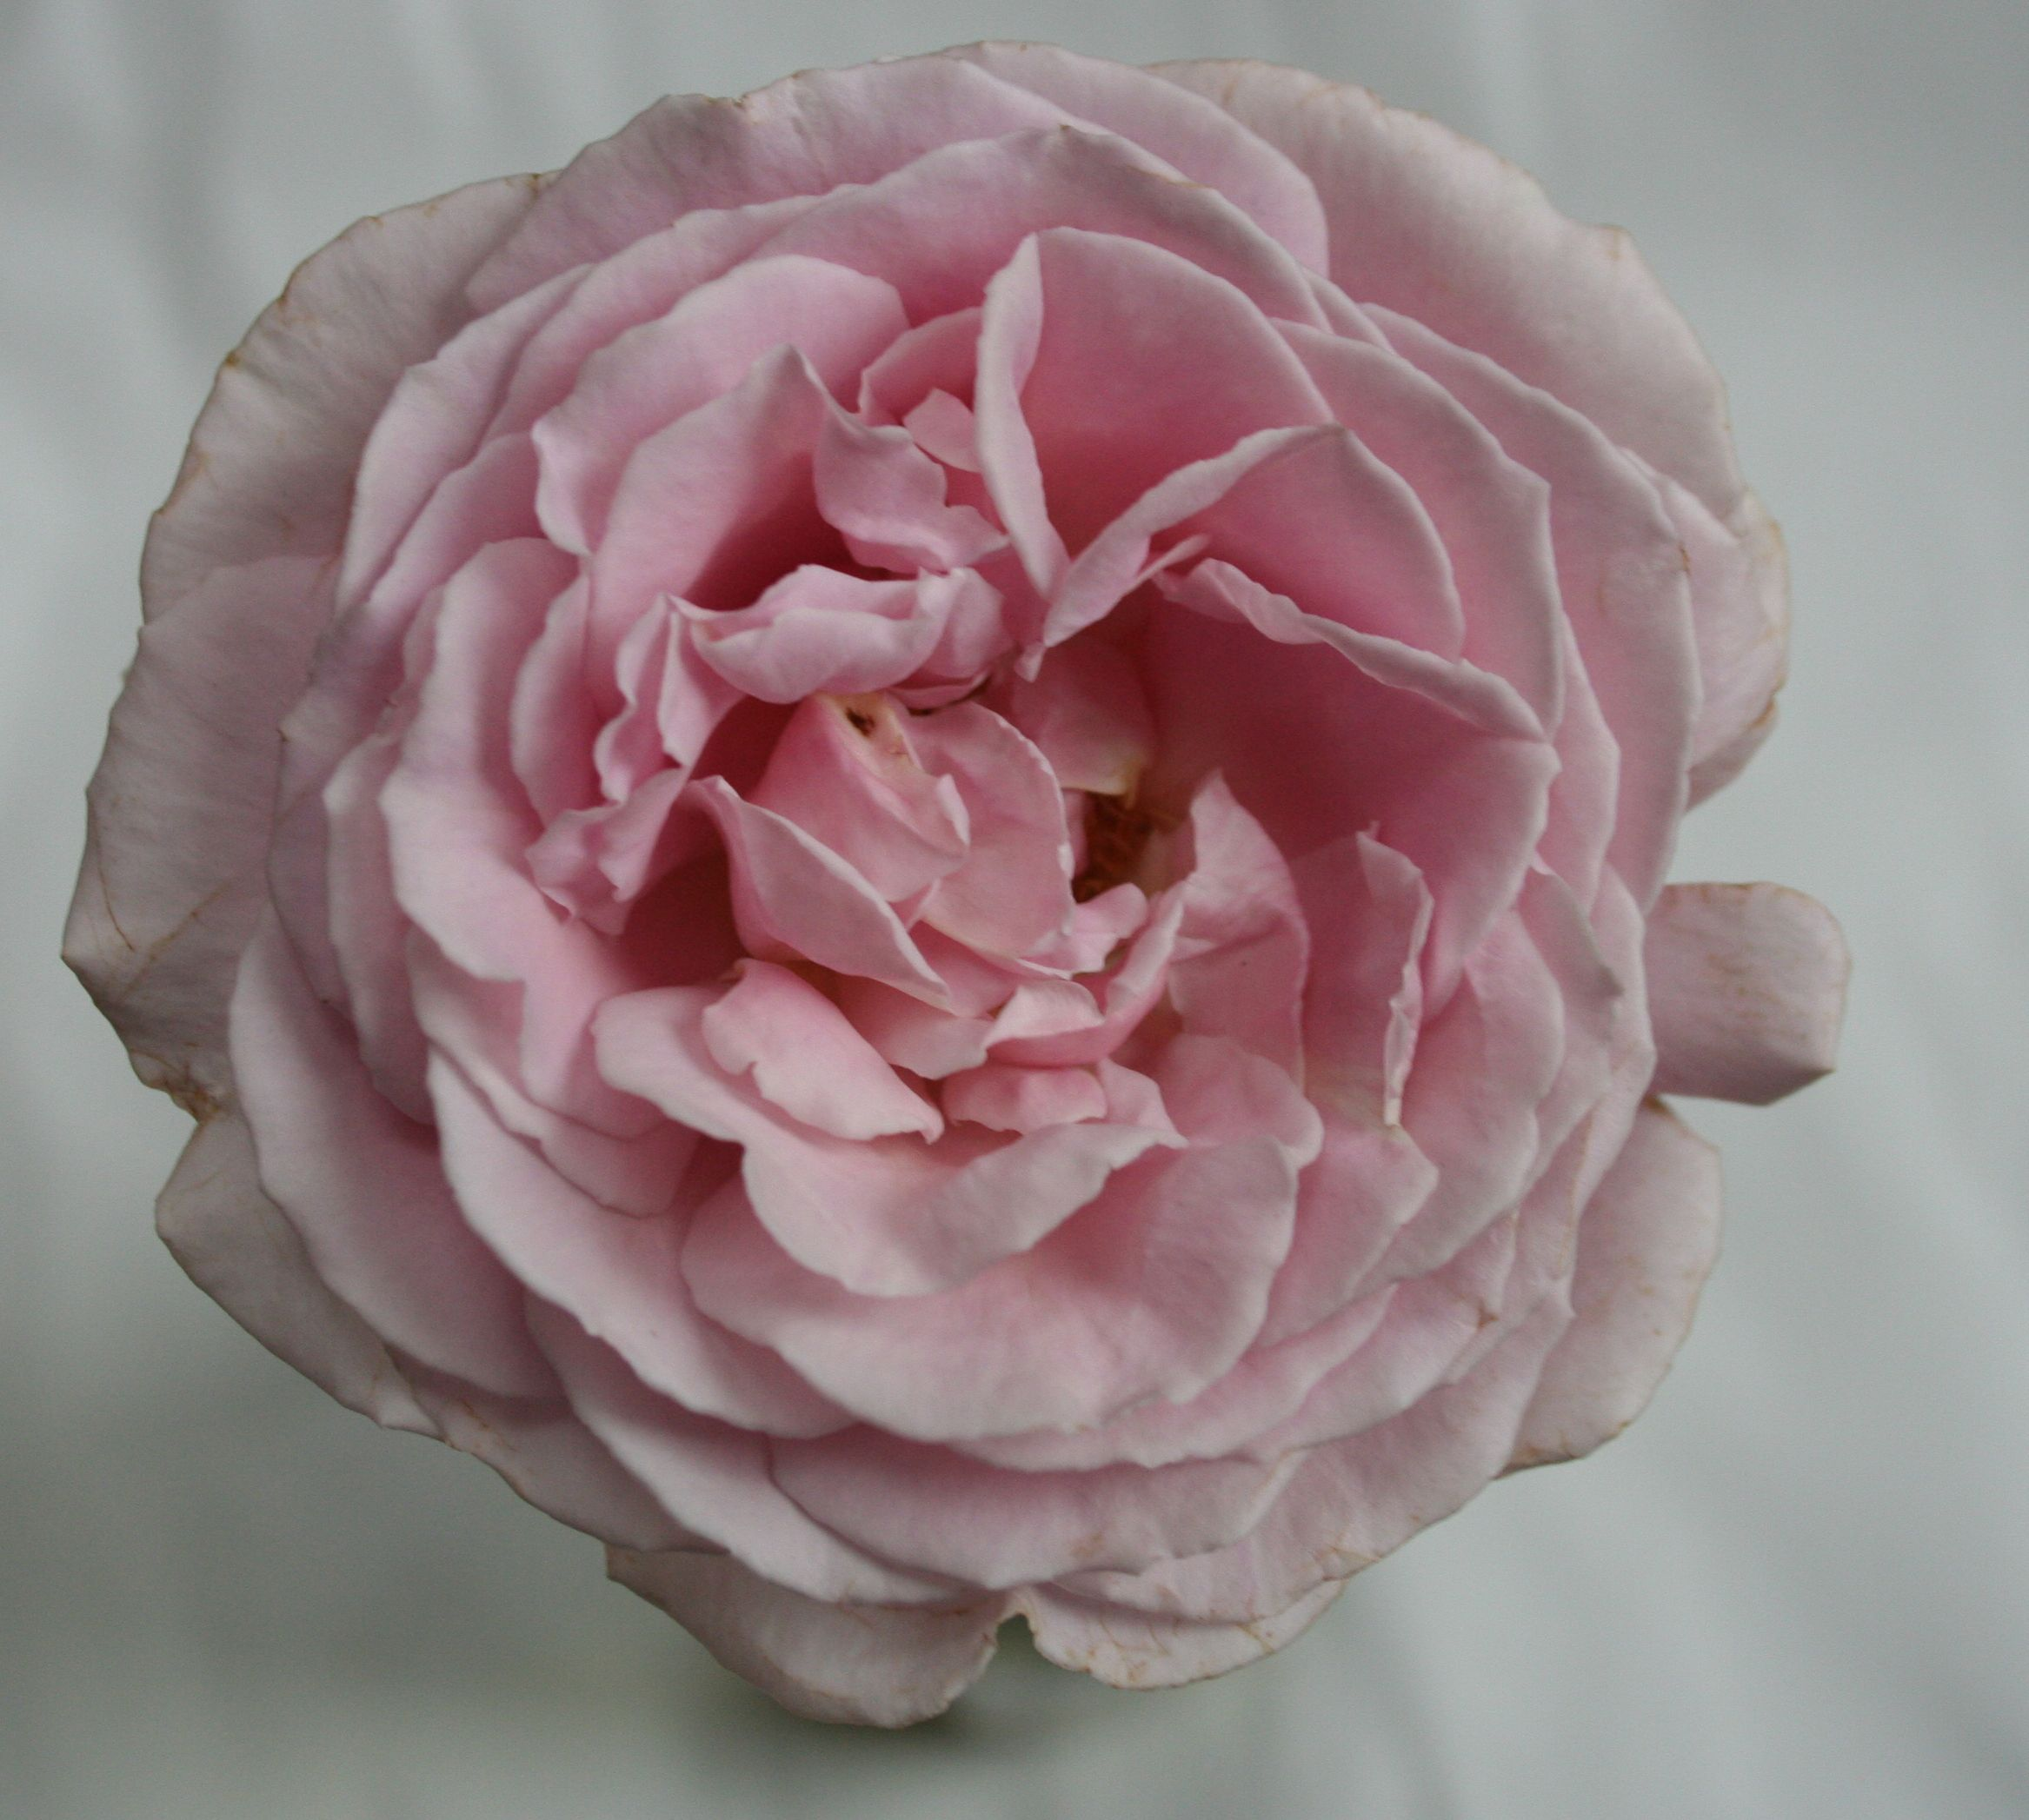 Frederick Mistrall. Order them online @ http://www.parfumflowercompany.com/